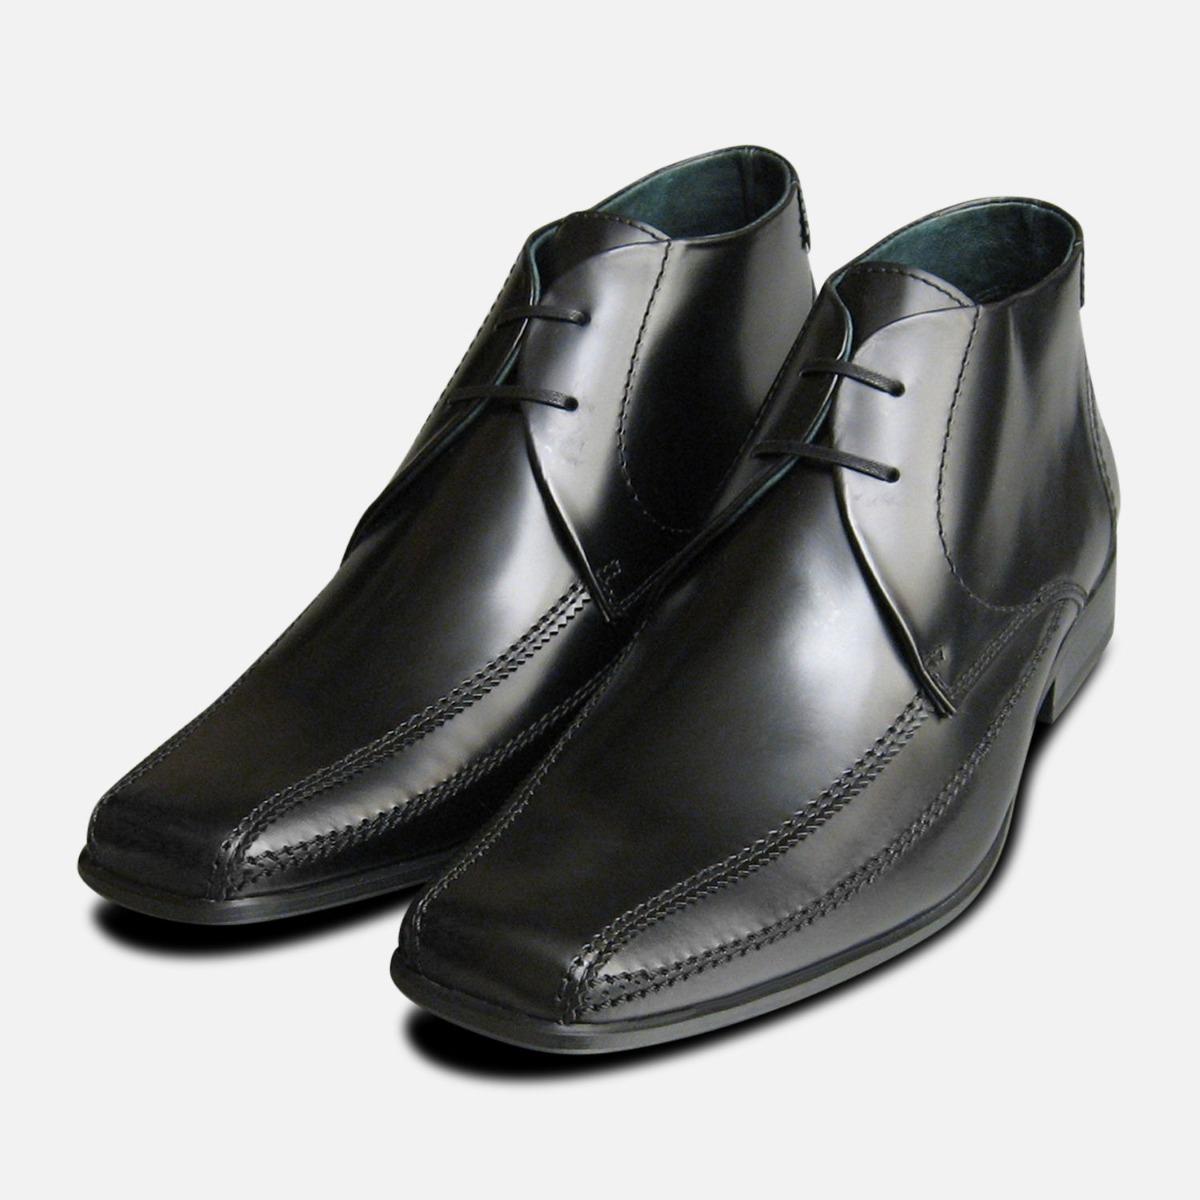 Exceed Black Polished Mens Chukka Boots